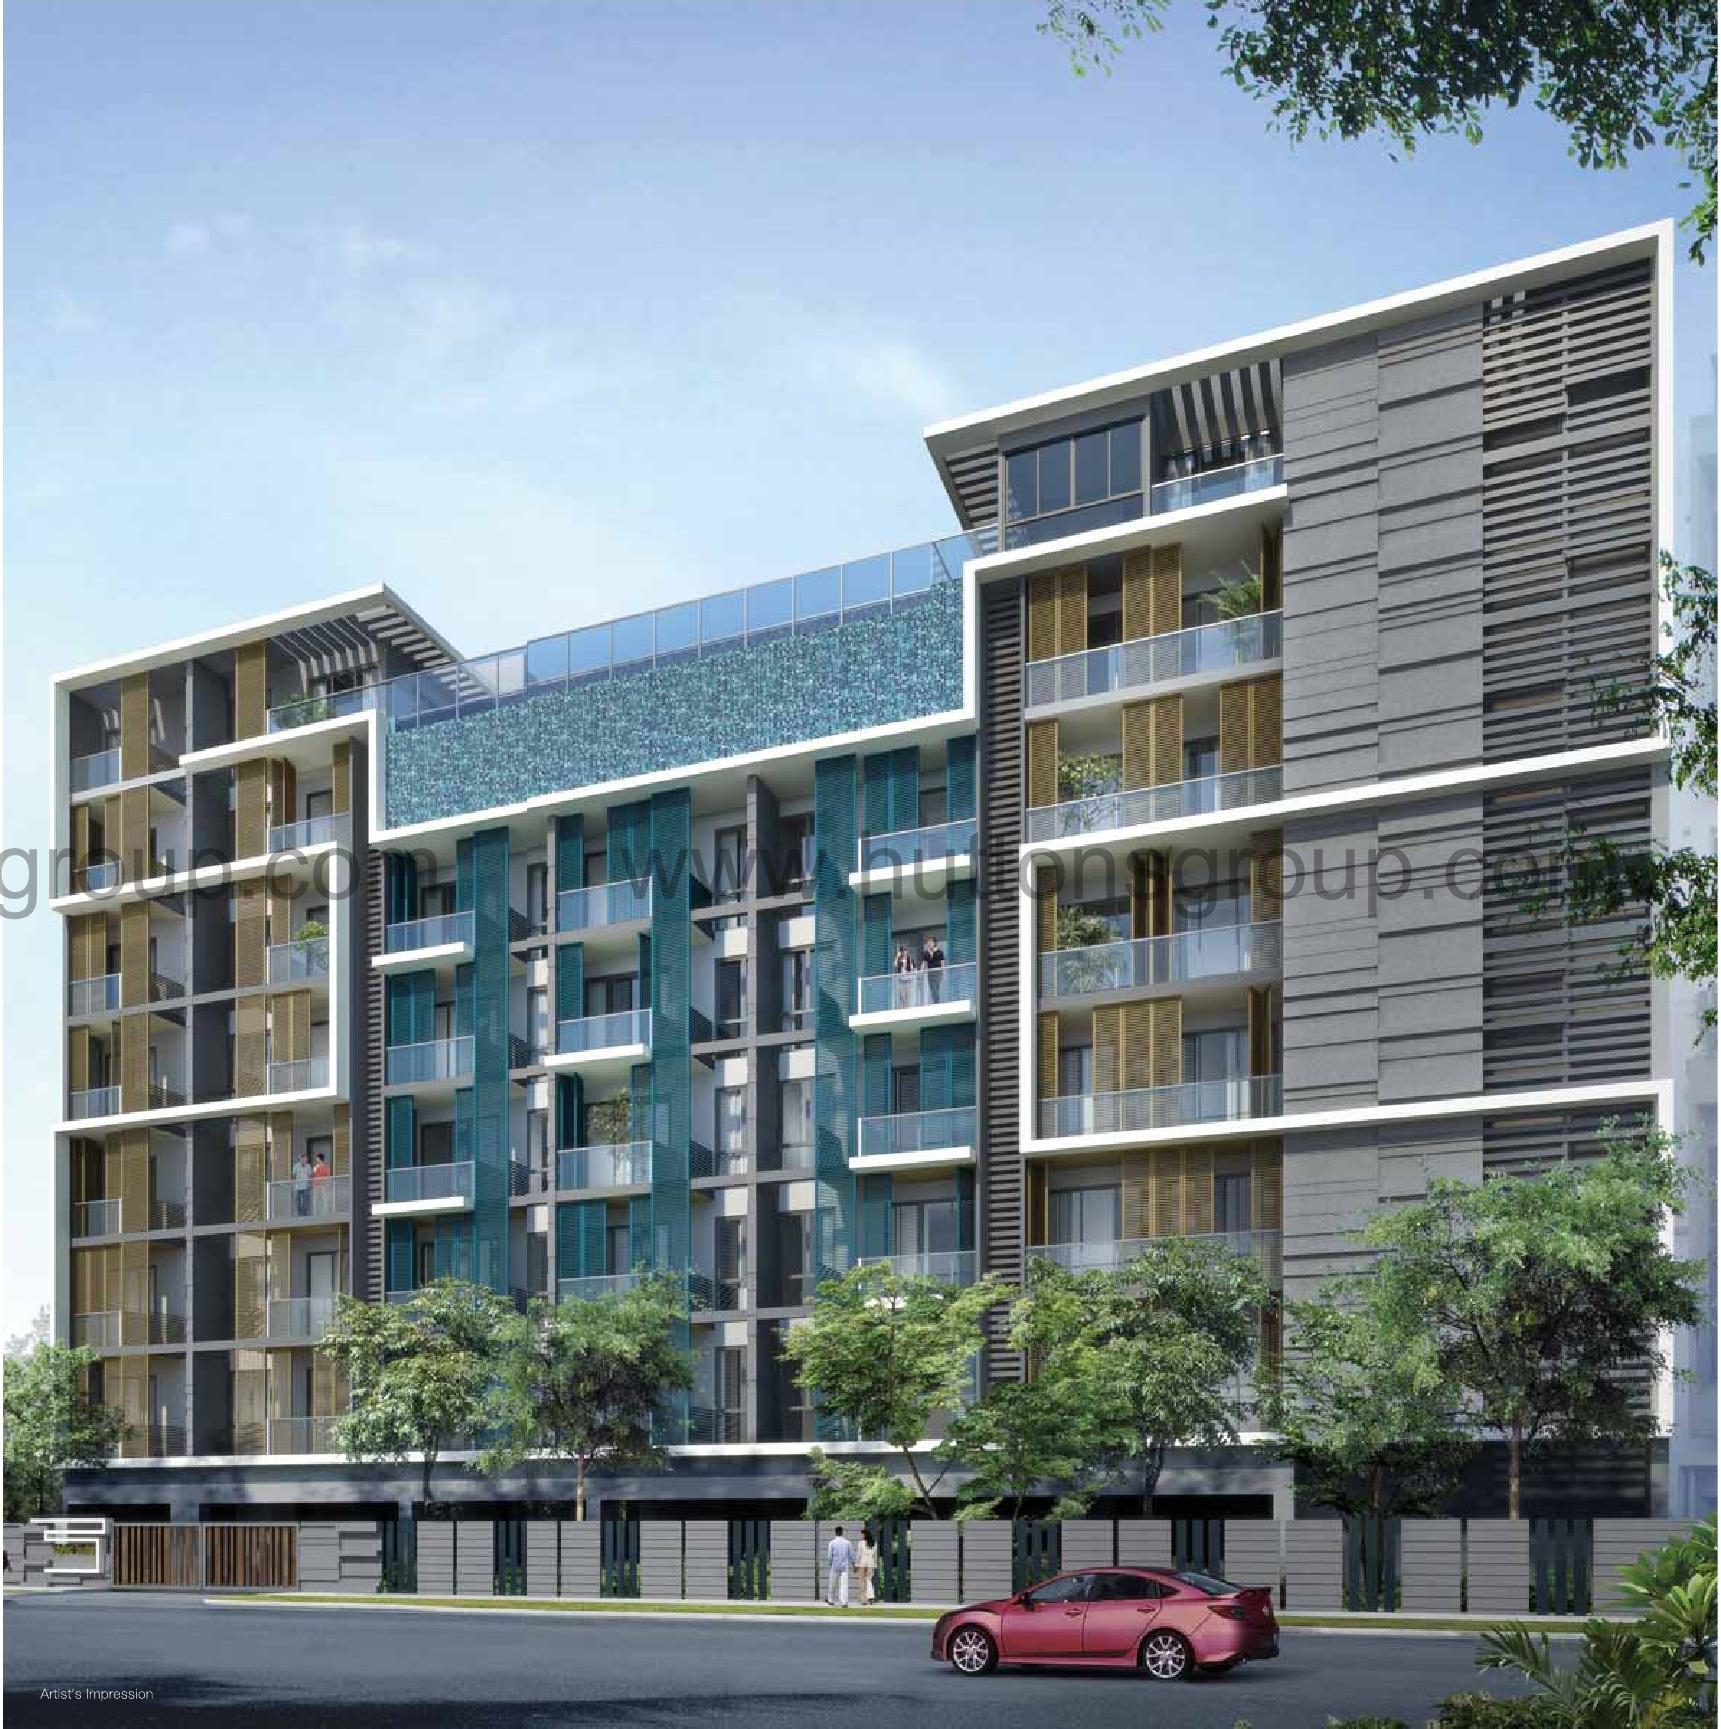 Idyllic-Suites Facade idyllic suites Idyllic Suites Singapore   Showflat Hotline +65 61007122 idyllic suites facade1